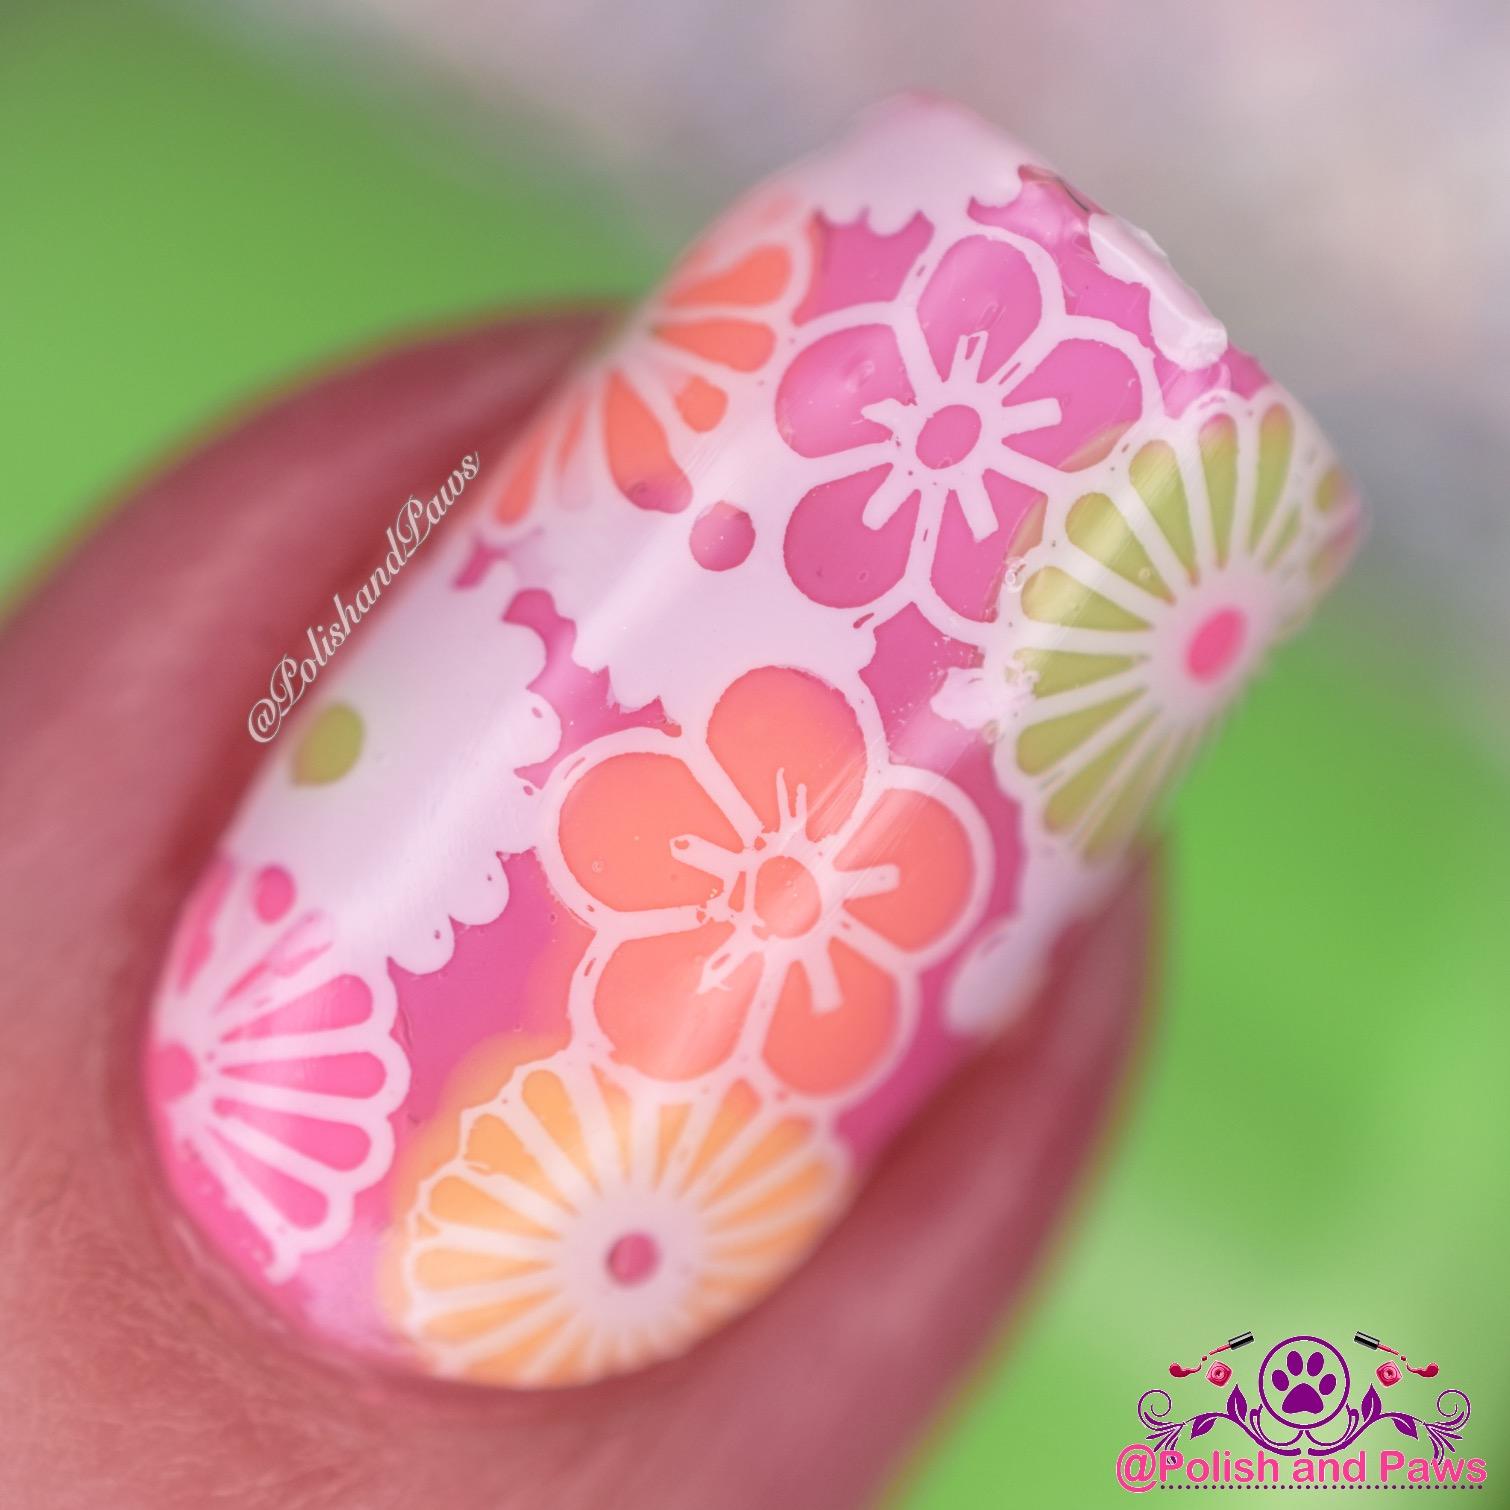 BPS LynB Nail Art